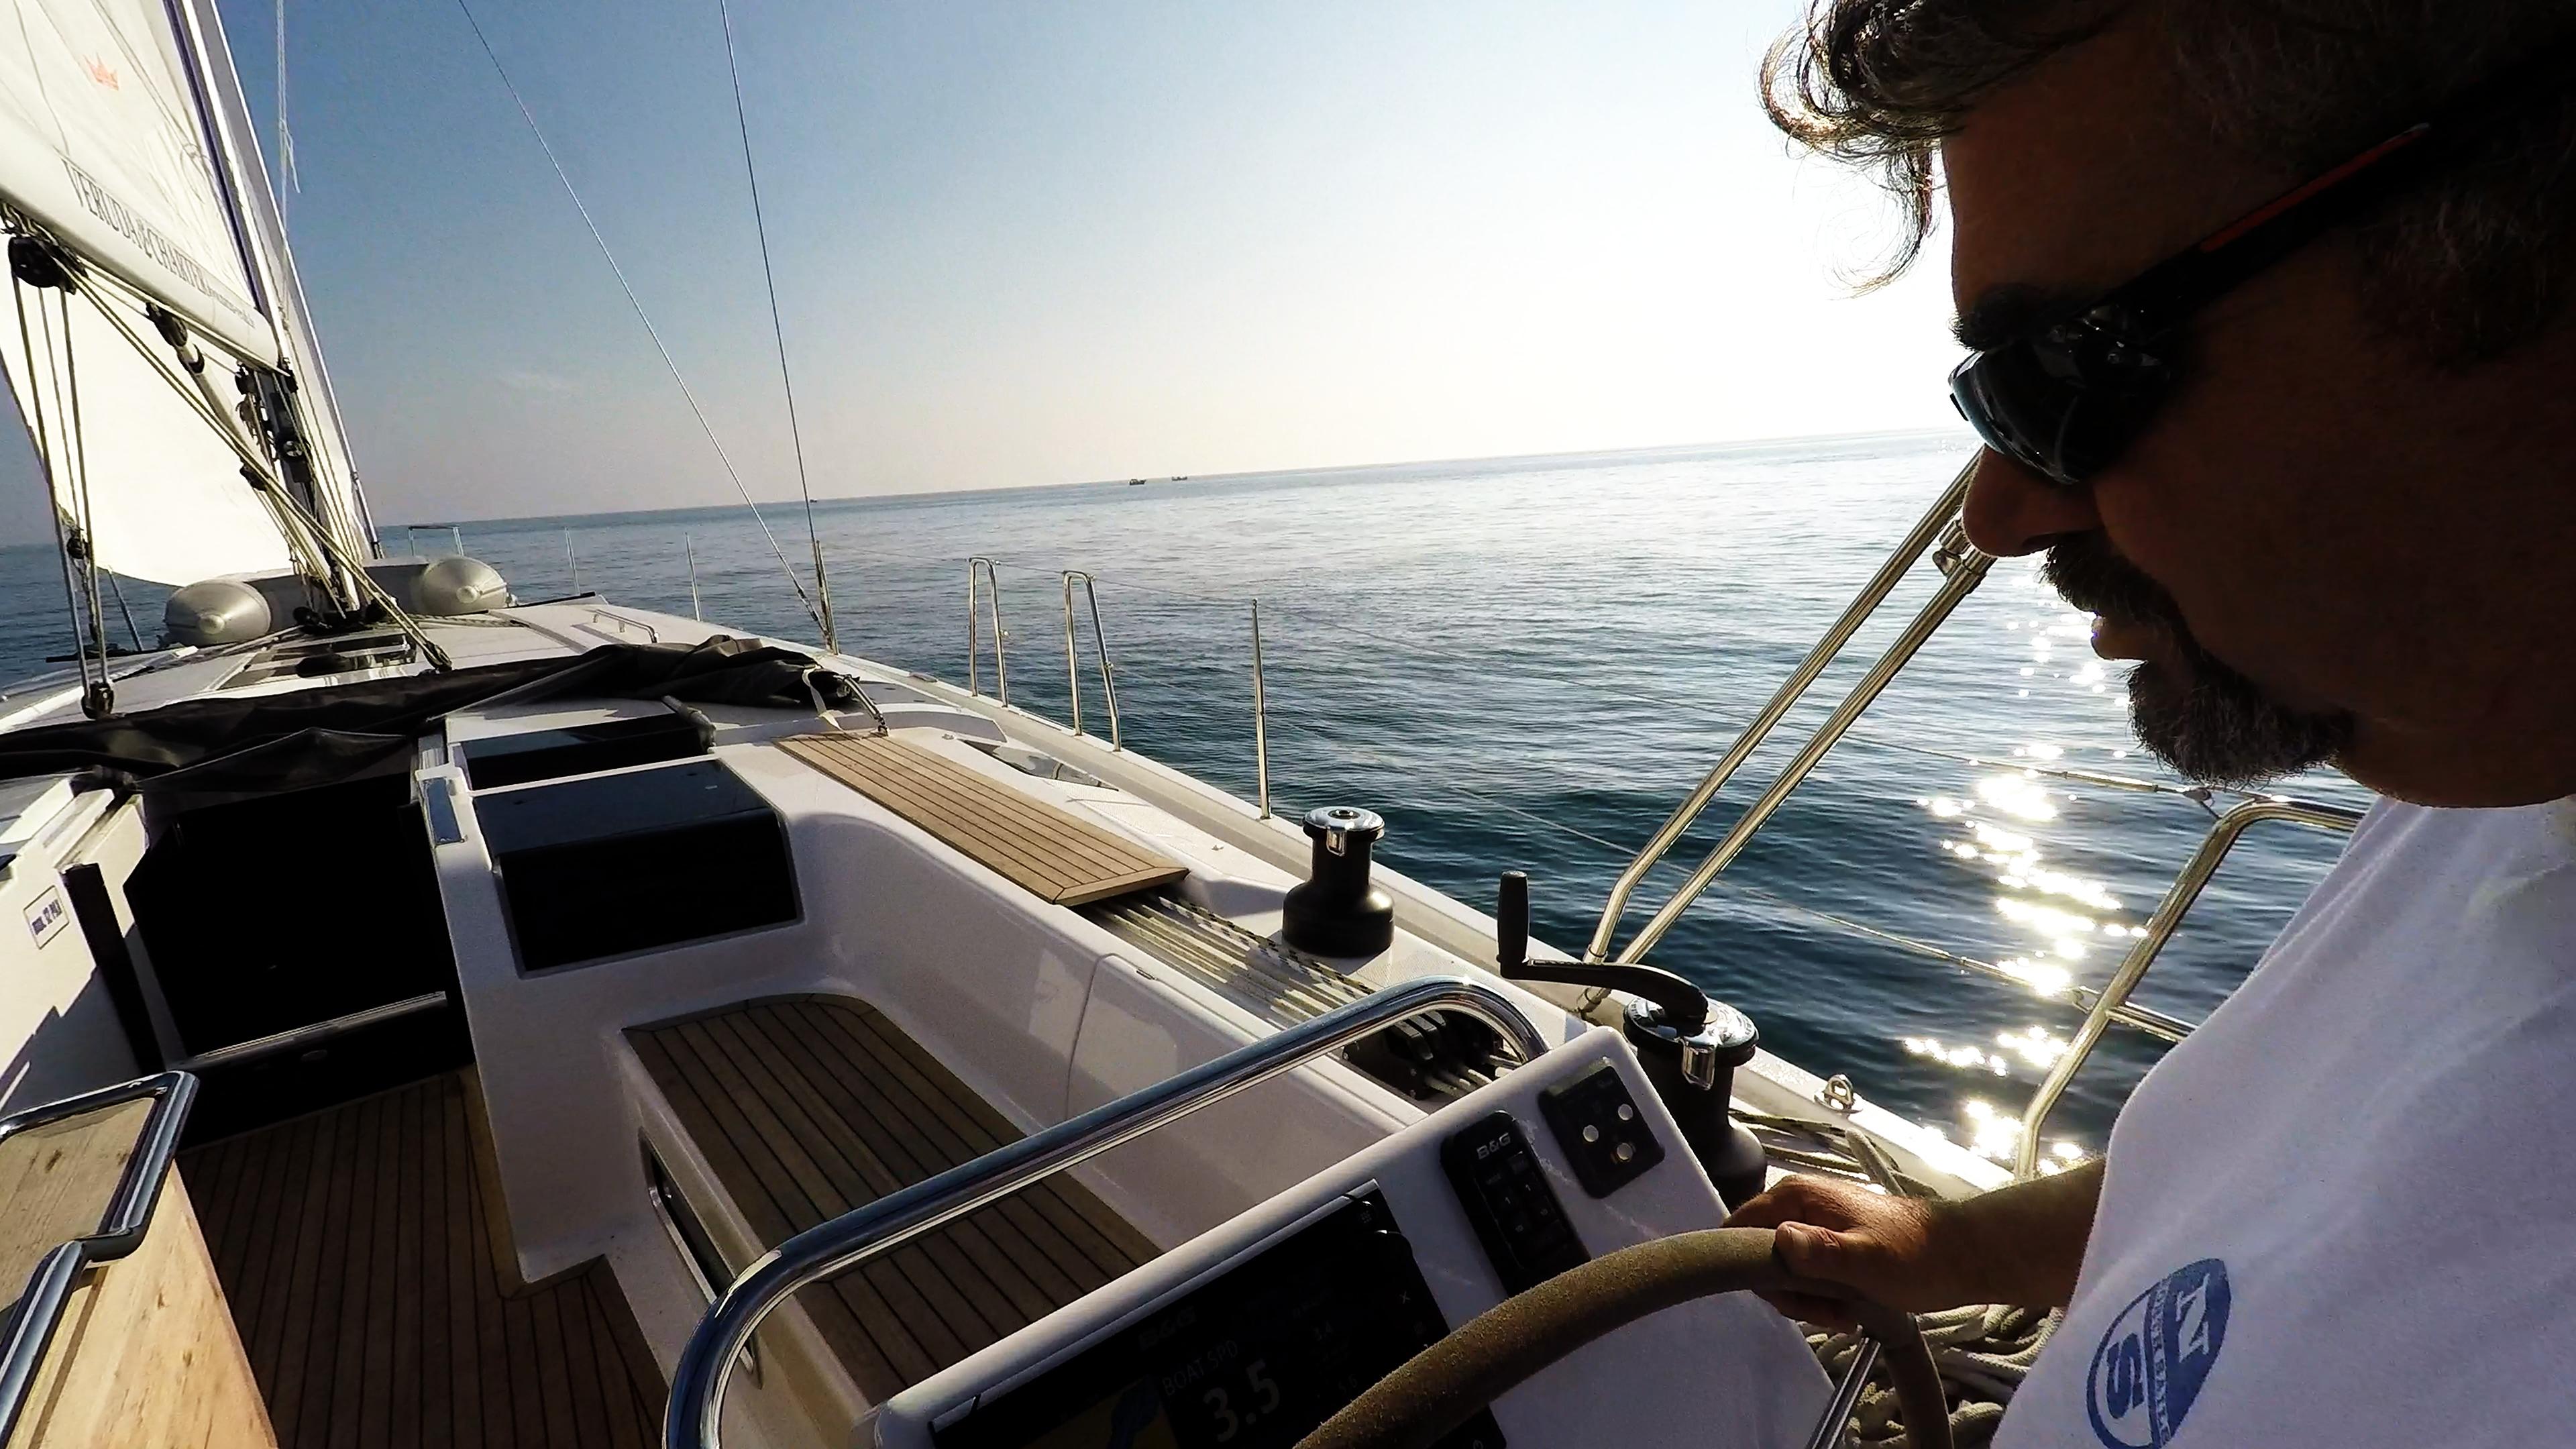 barcha a vela skipper barca a vela pozzetto teak yacht a vela Hanse 505